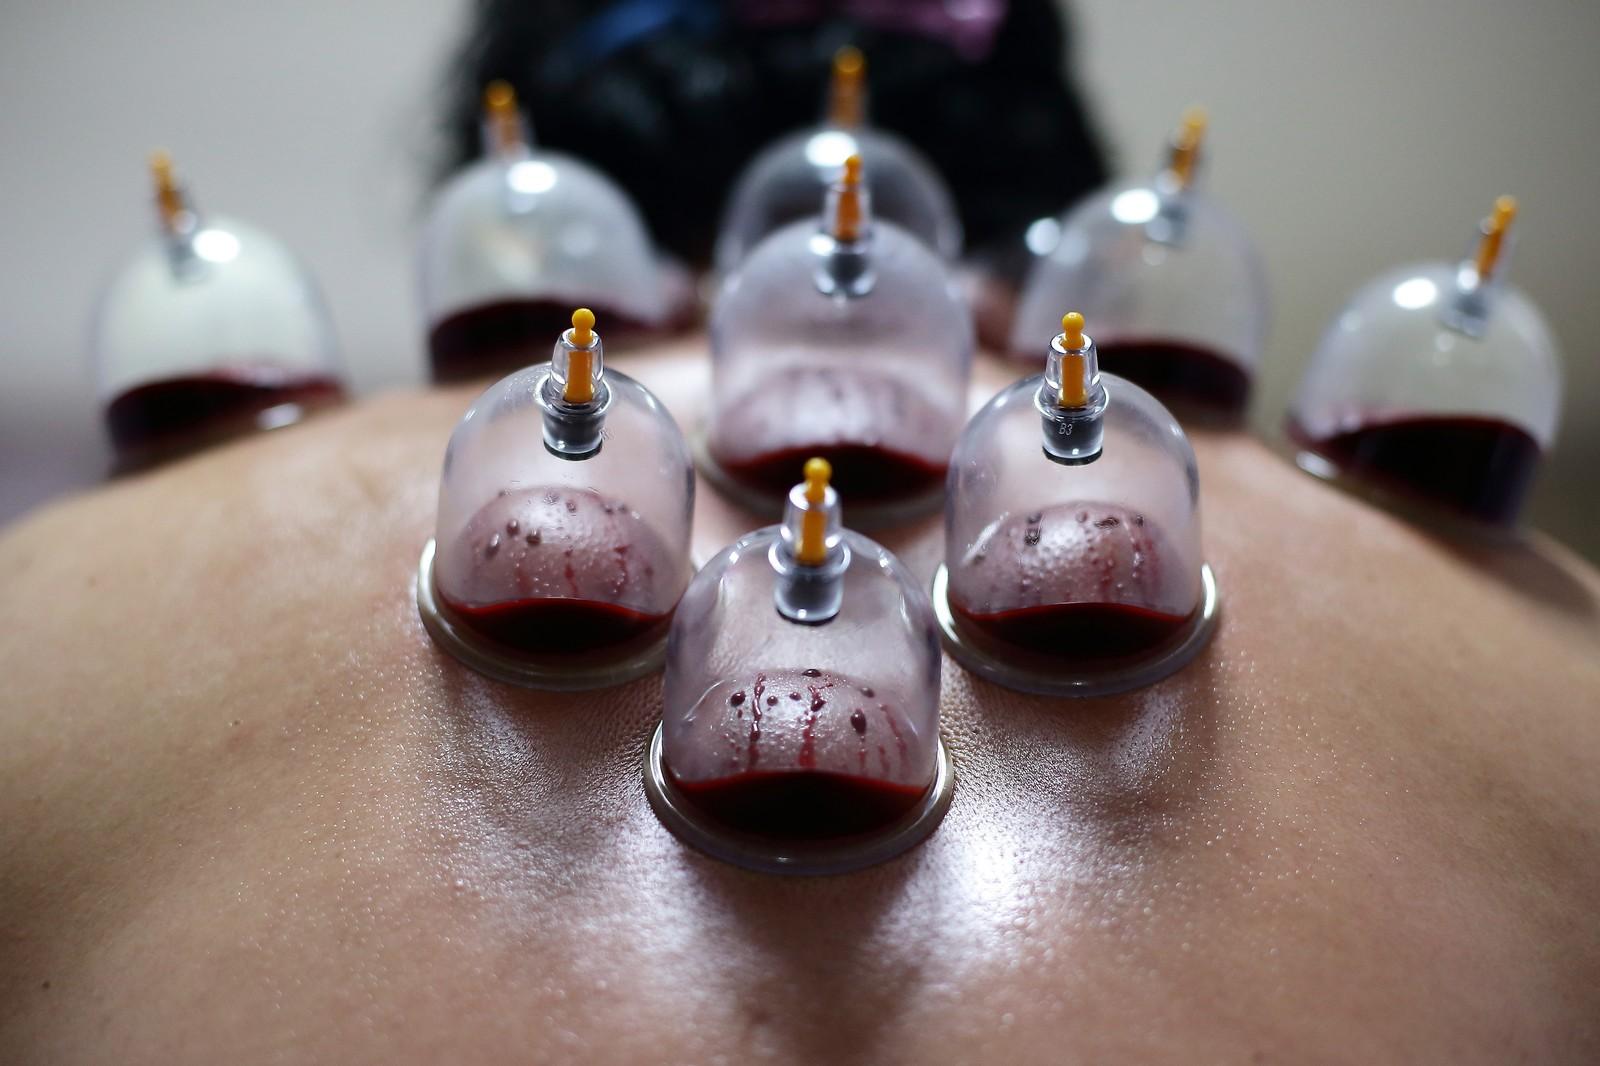 остеохондроз позвоночника лечение мазями